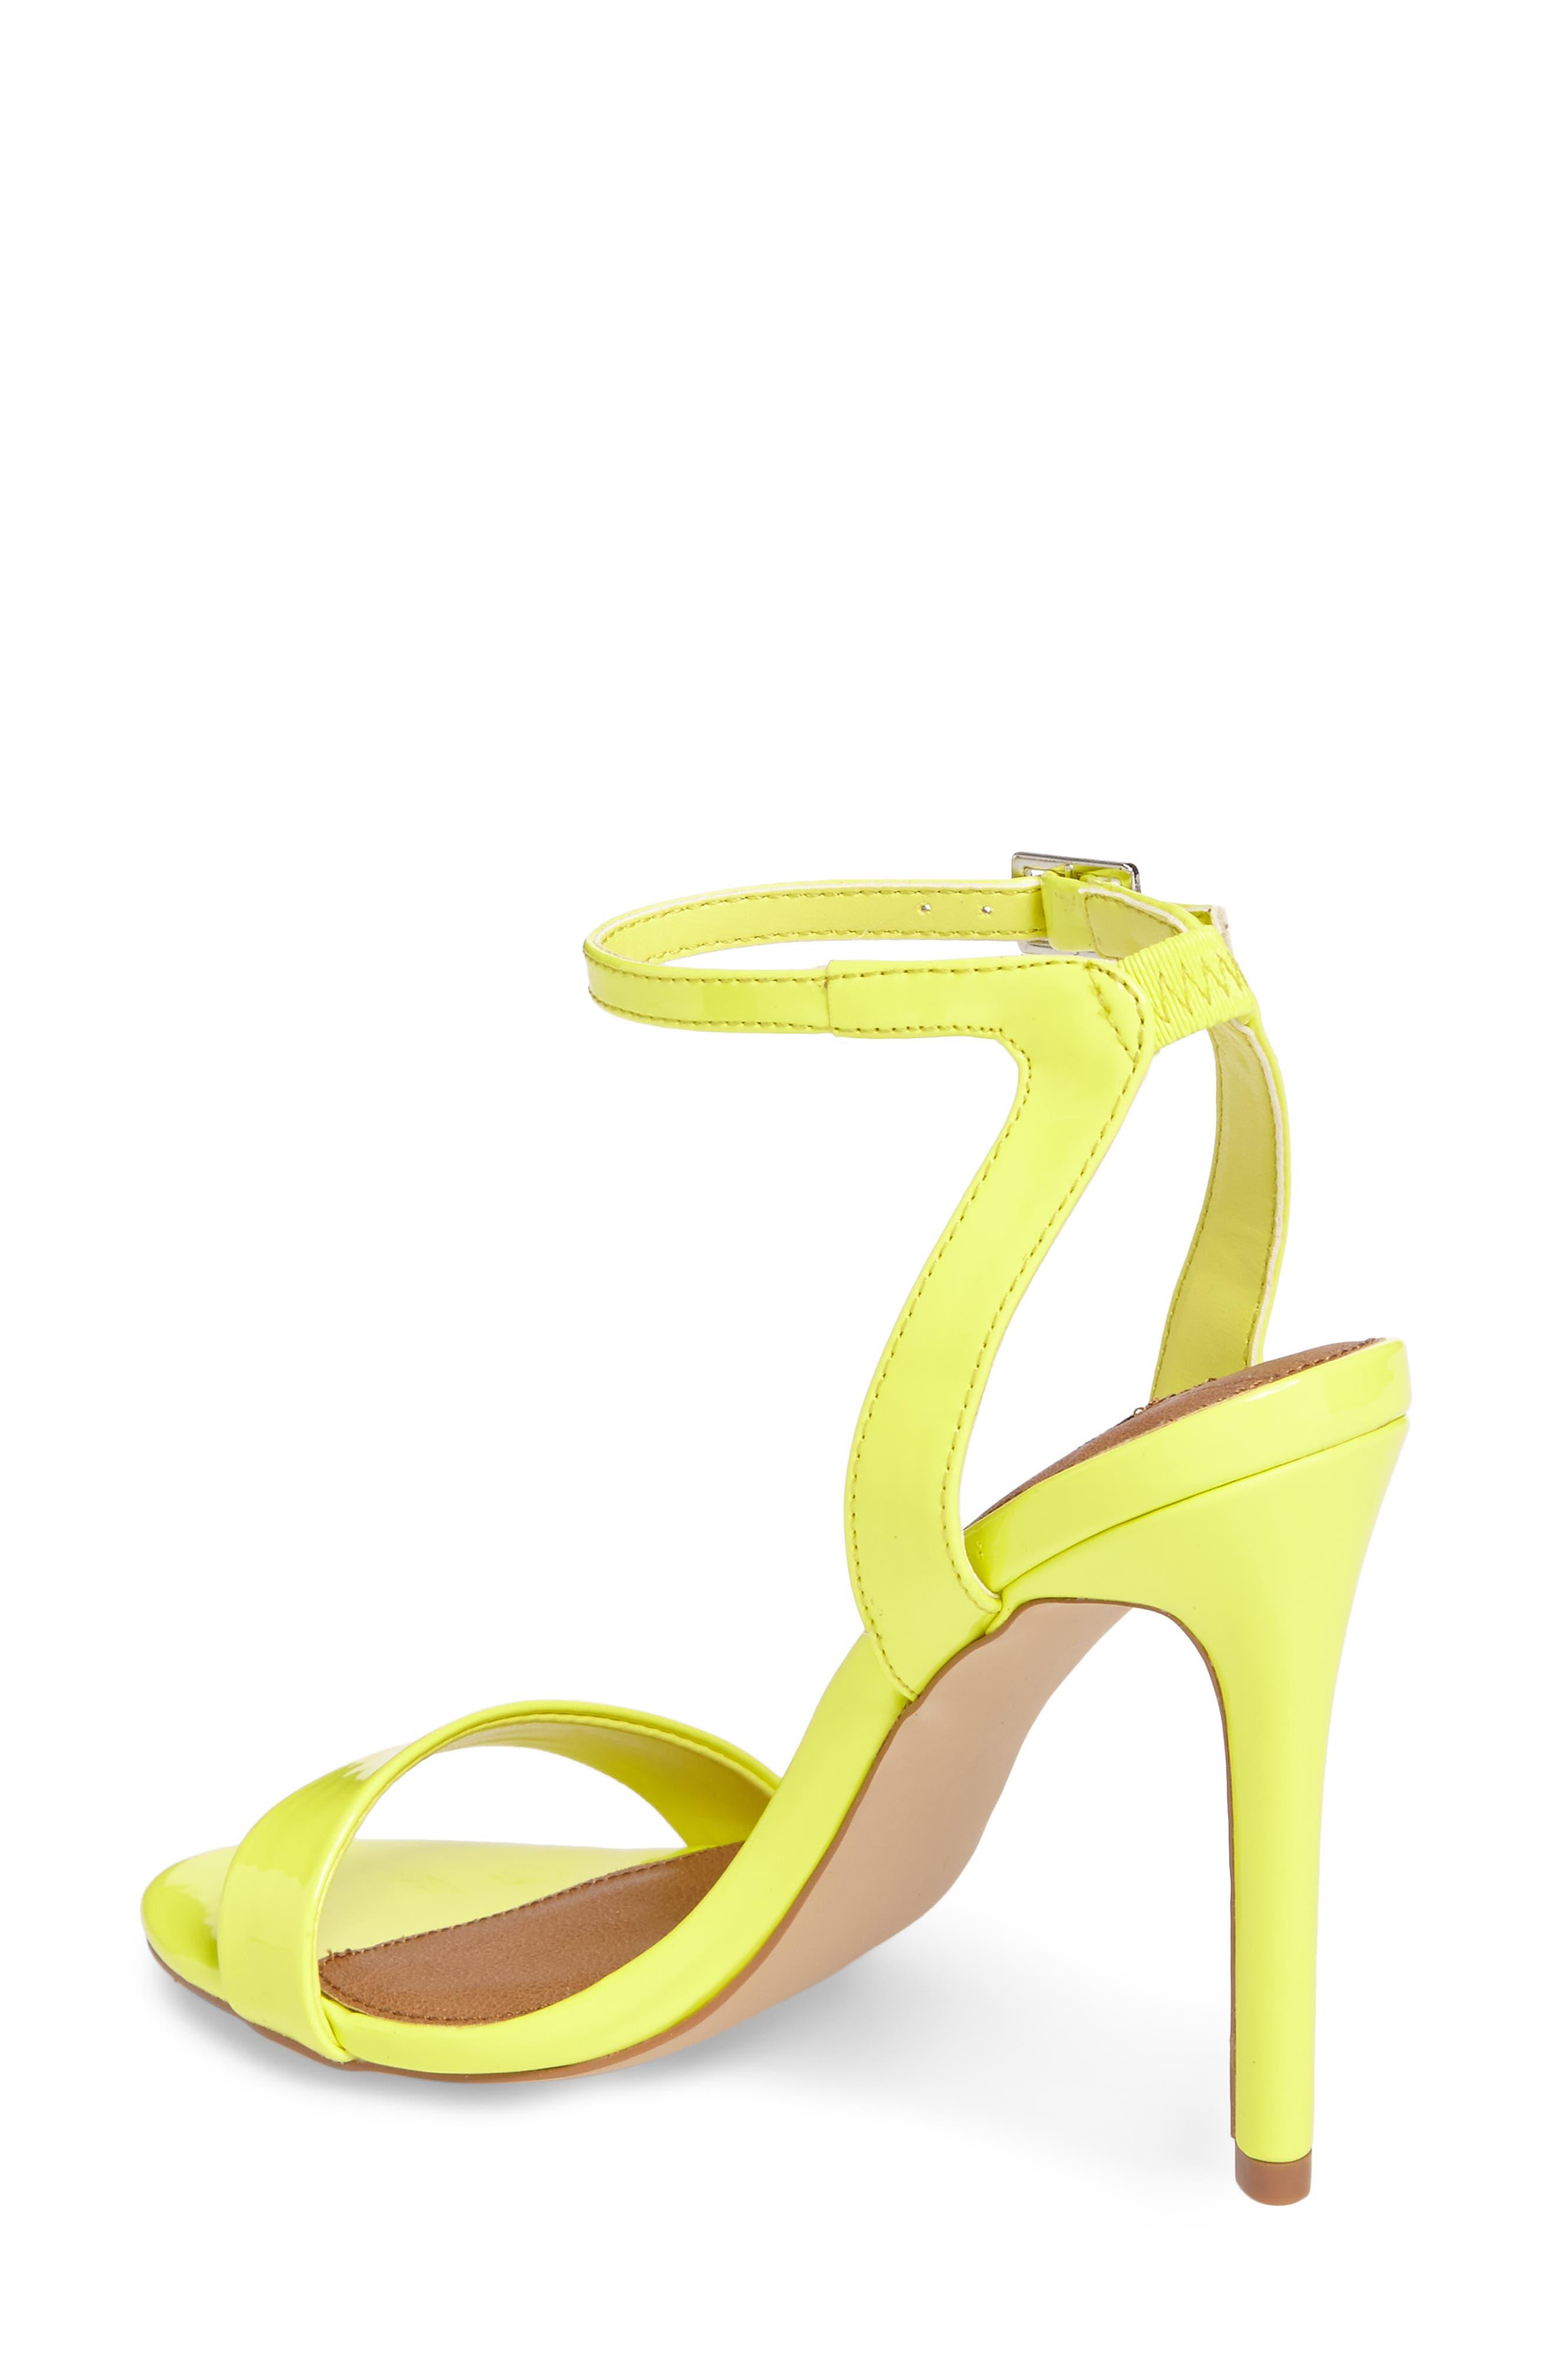 Landen Ankle Strap Sandal,                             Alternate thumbnail 25, color,